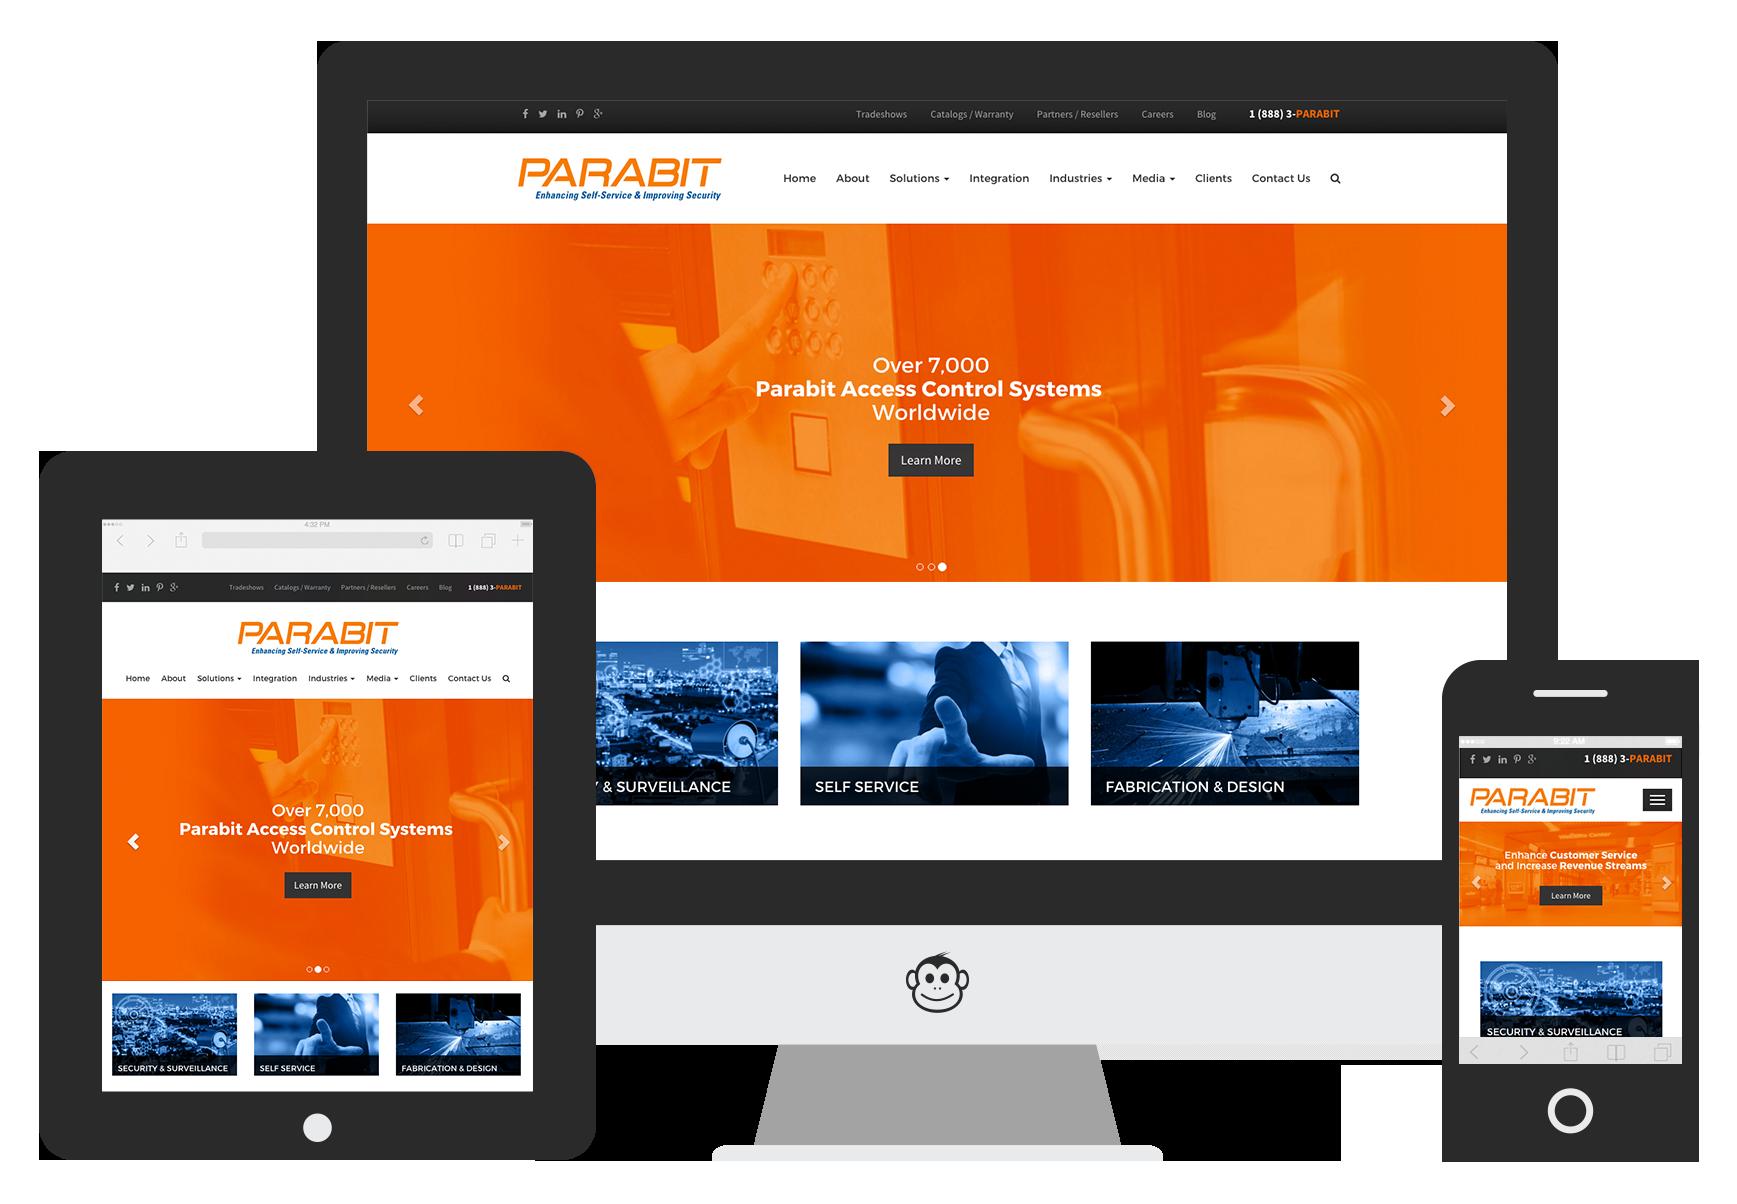 https://www.logicwebmedia.com/wp-content/uploads/multi-platform-web-design-parabit.png